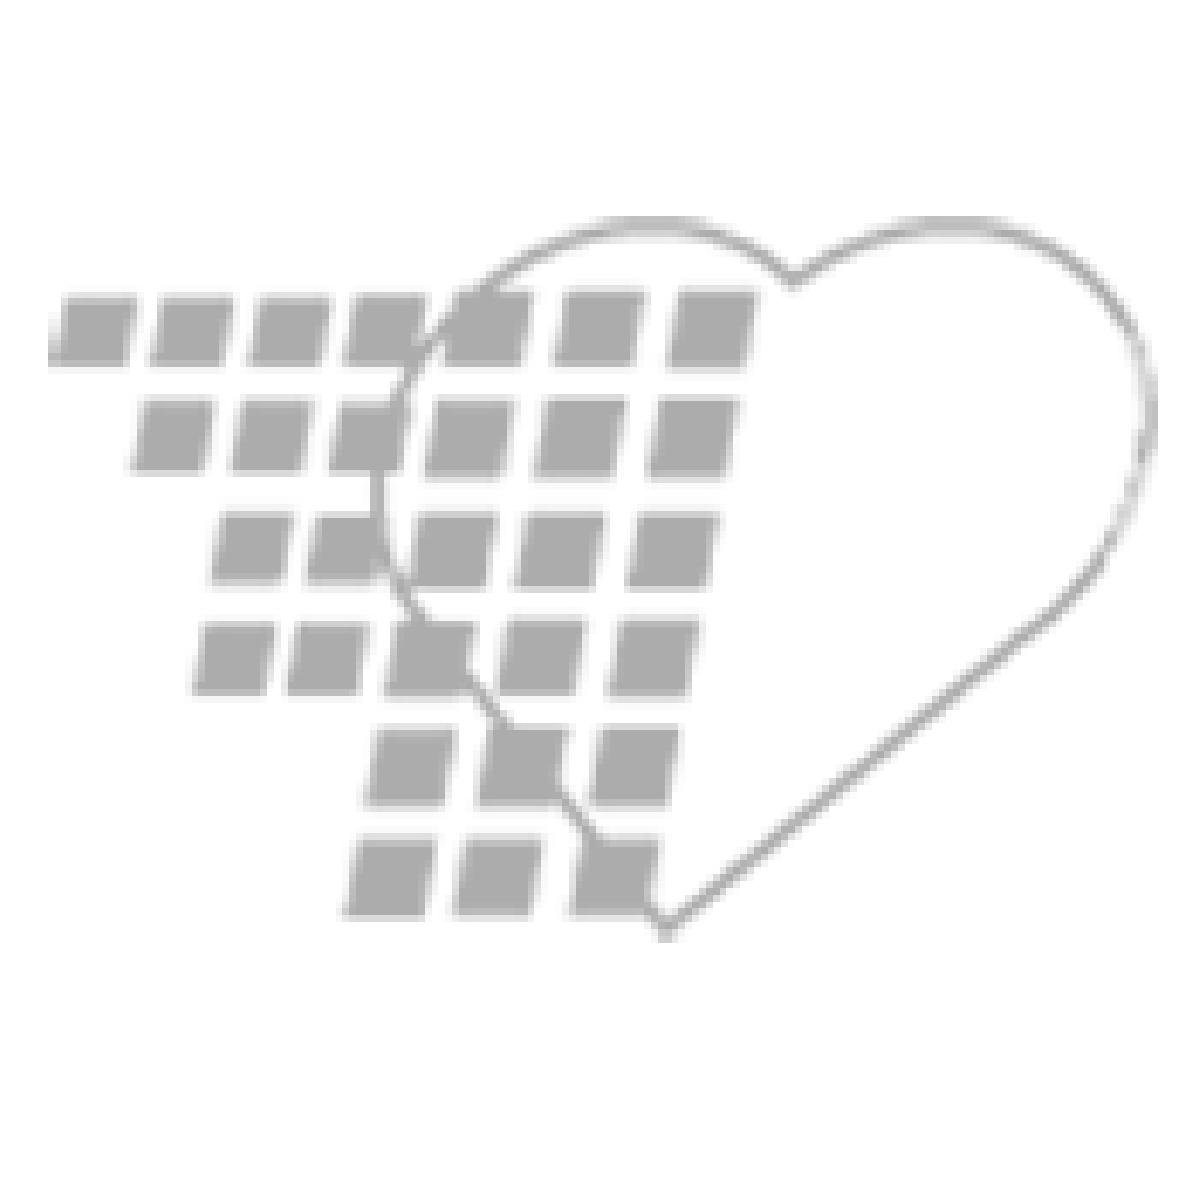 09-31-9758 Understanding Breast Cancer Chart